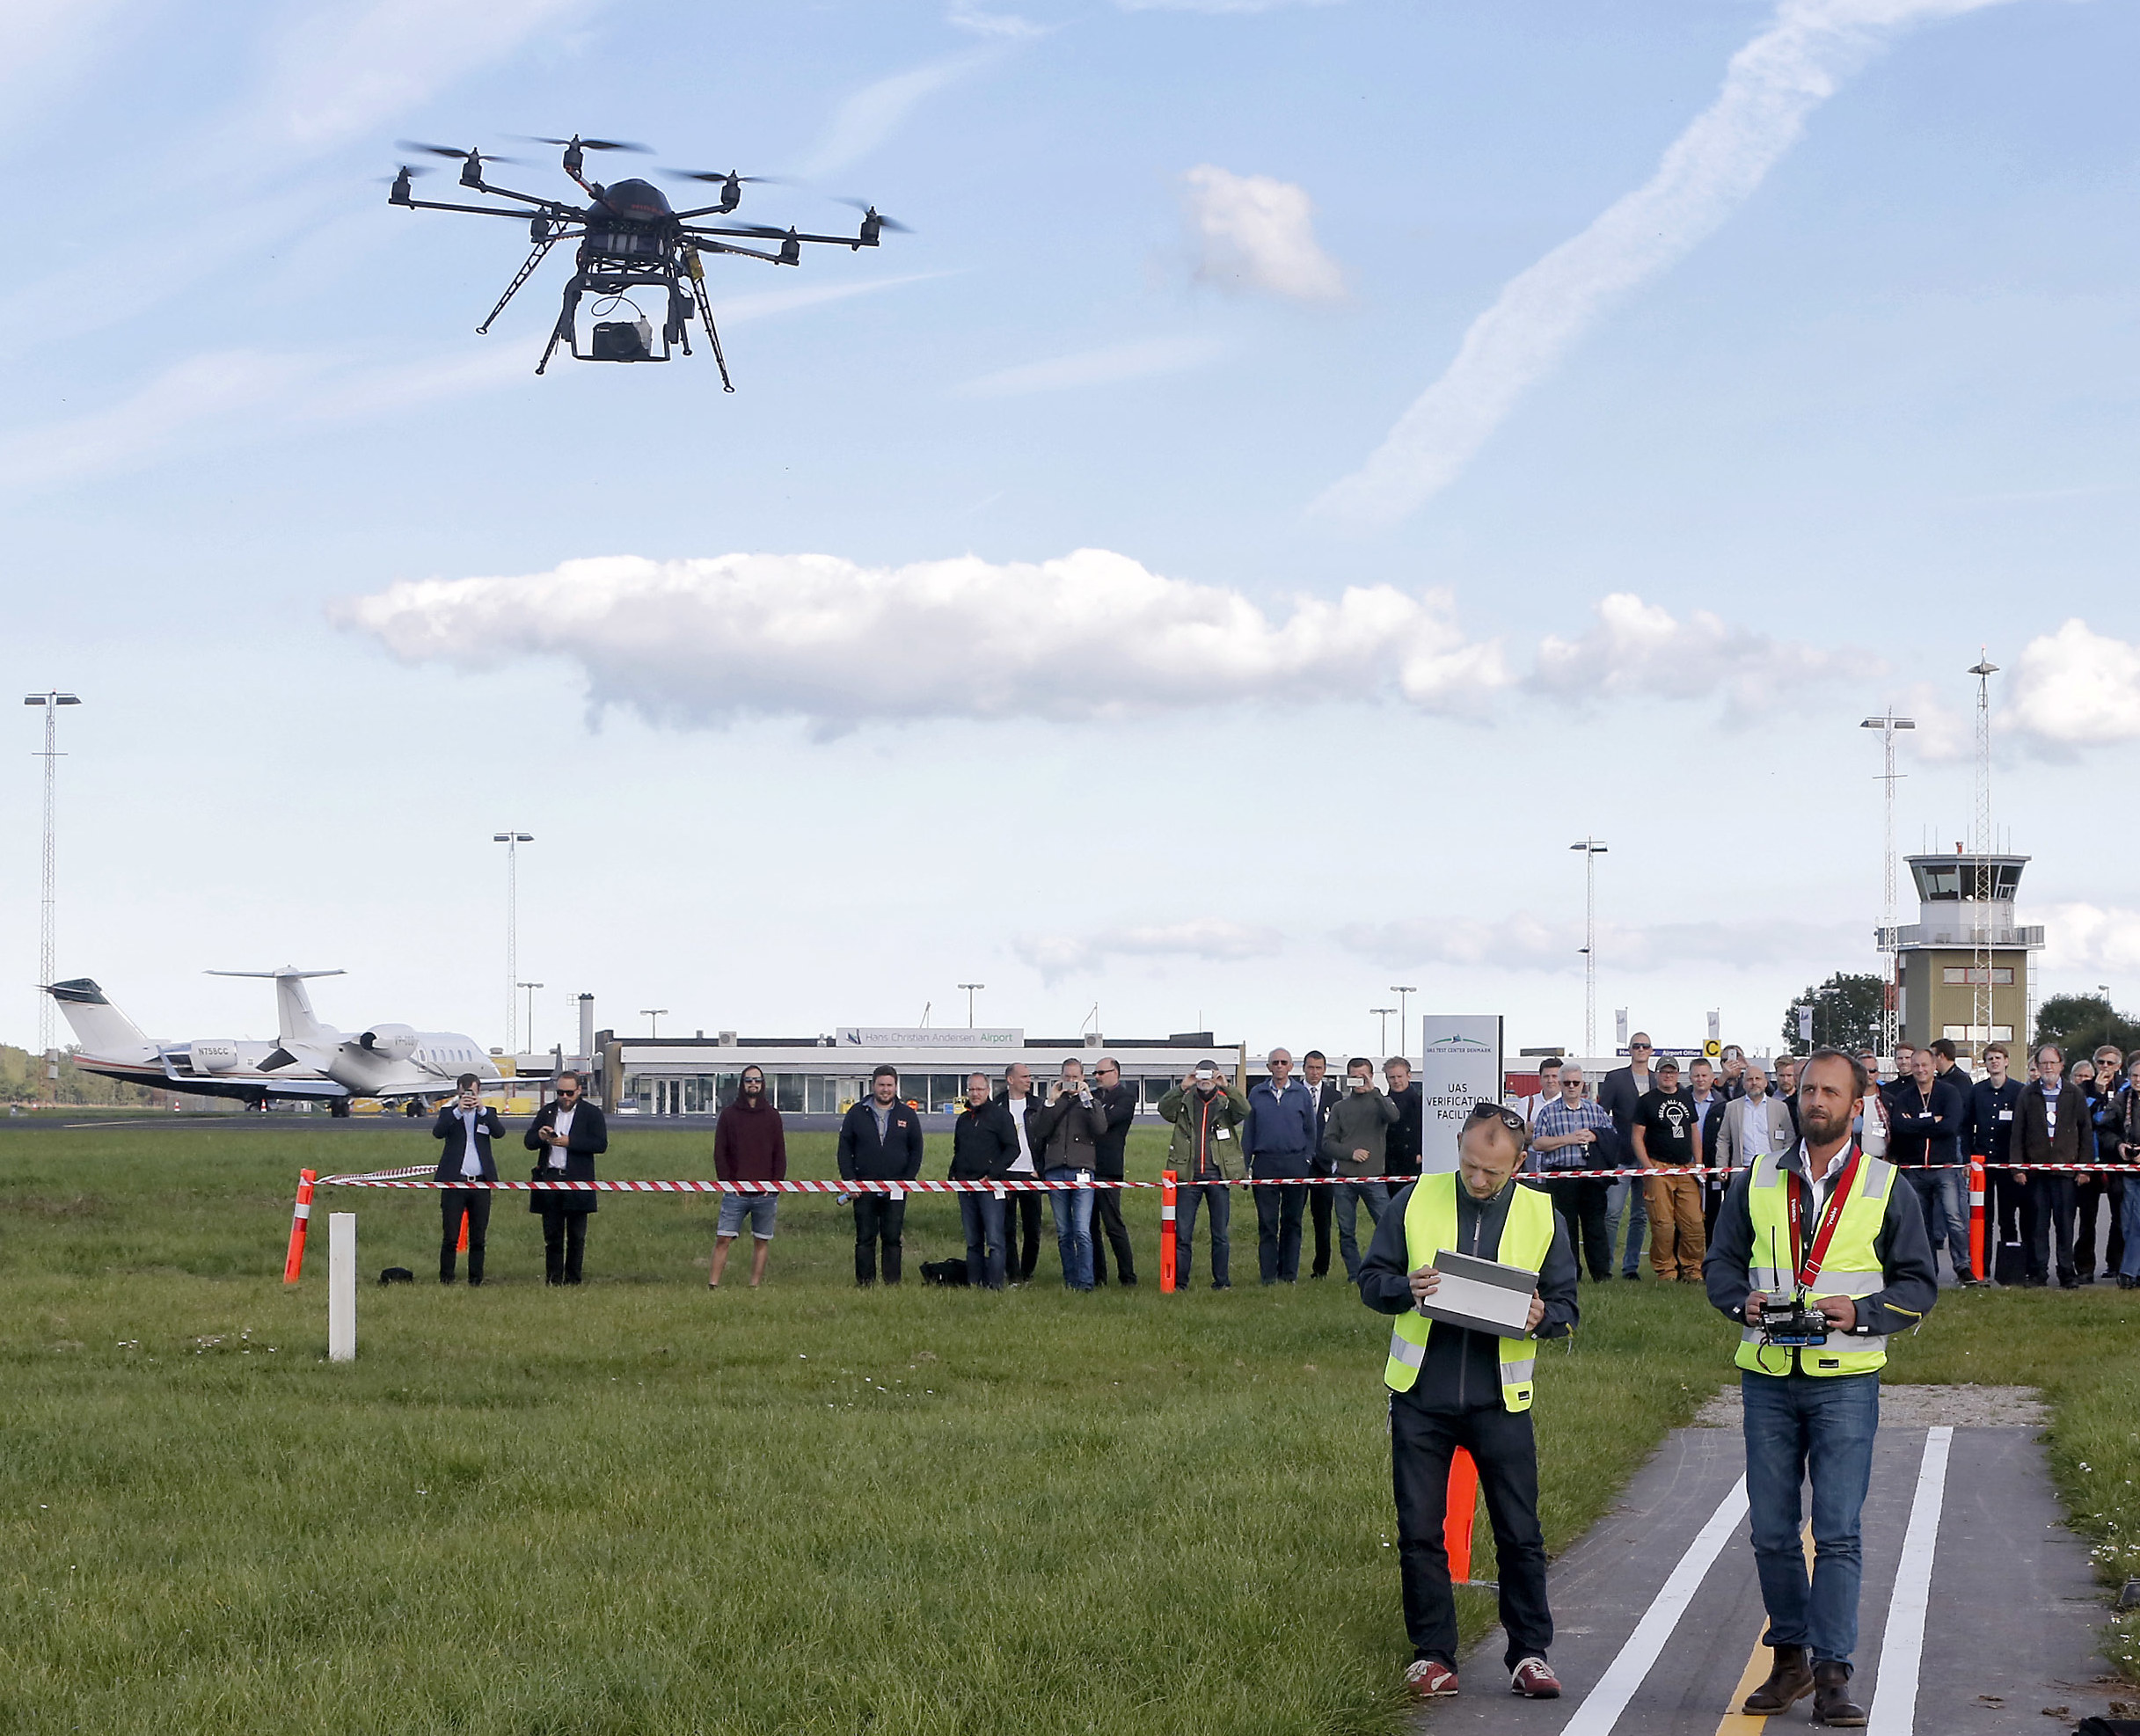 Droneflyvning i H.C Andersen Airport. arkiv 362